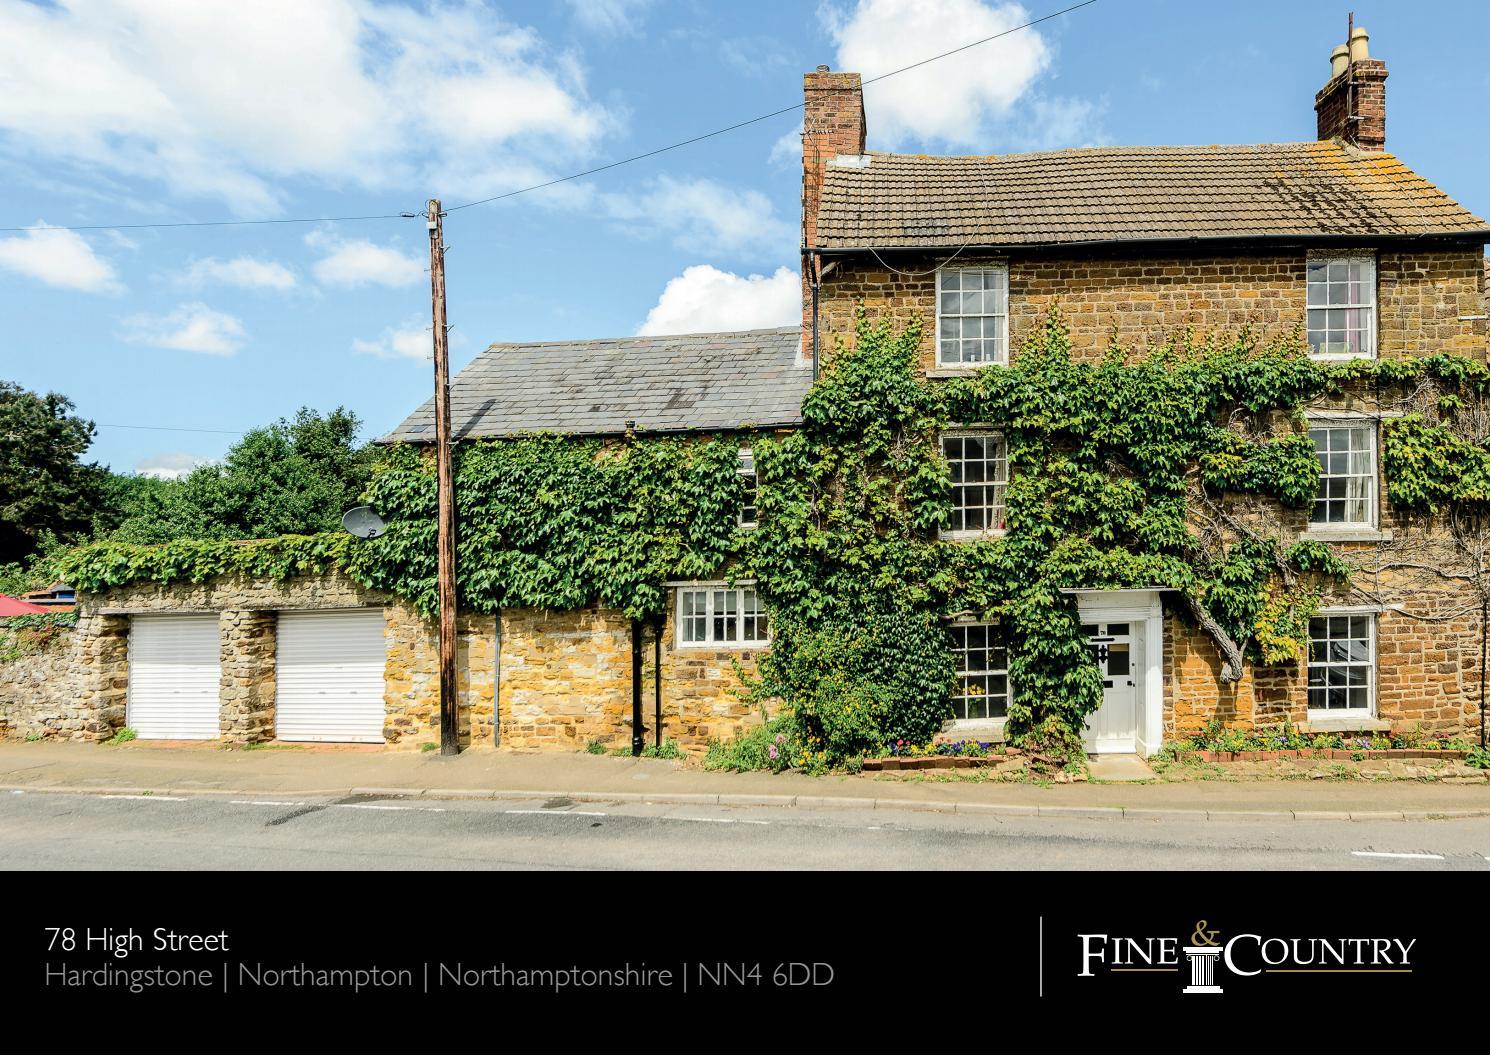 High Street Hardingstone Northampton